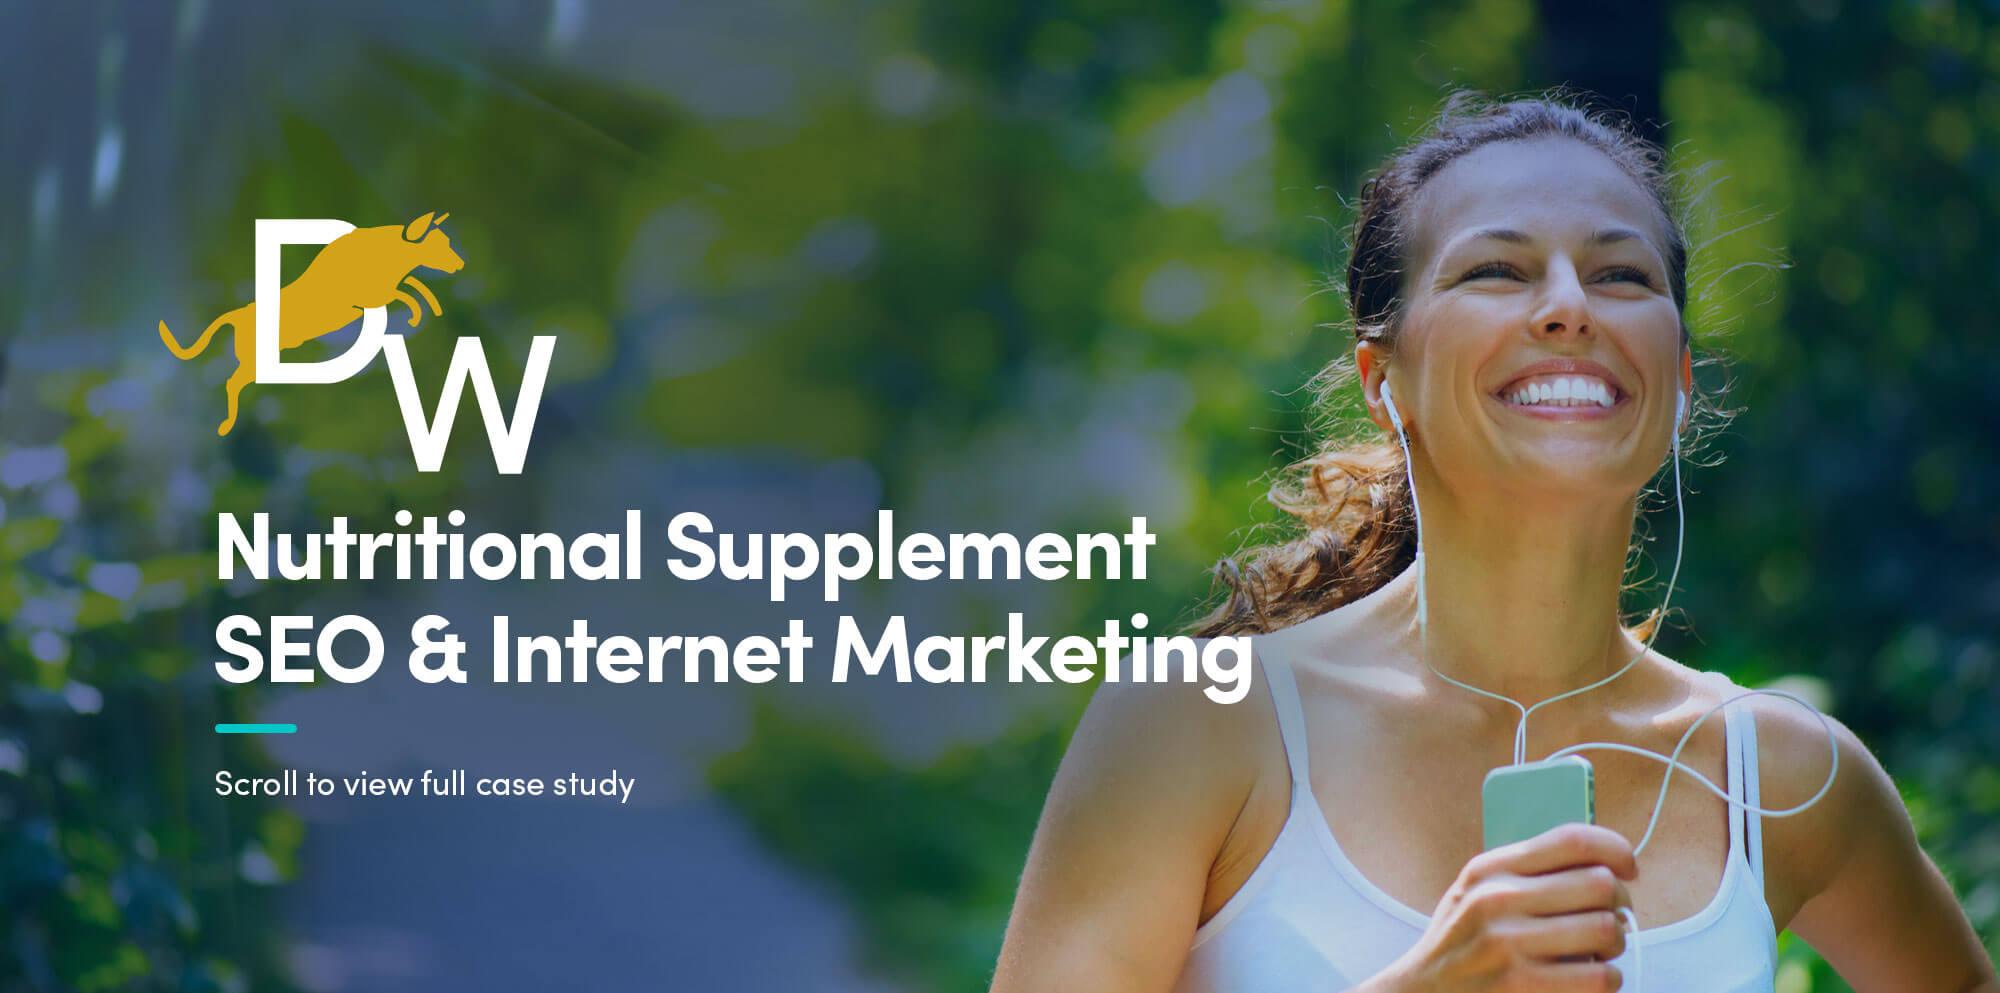 Nutritional Supplement Internet Marketing